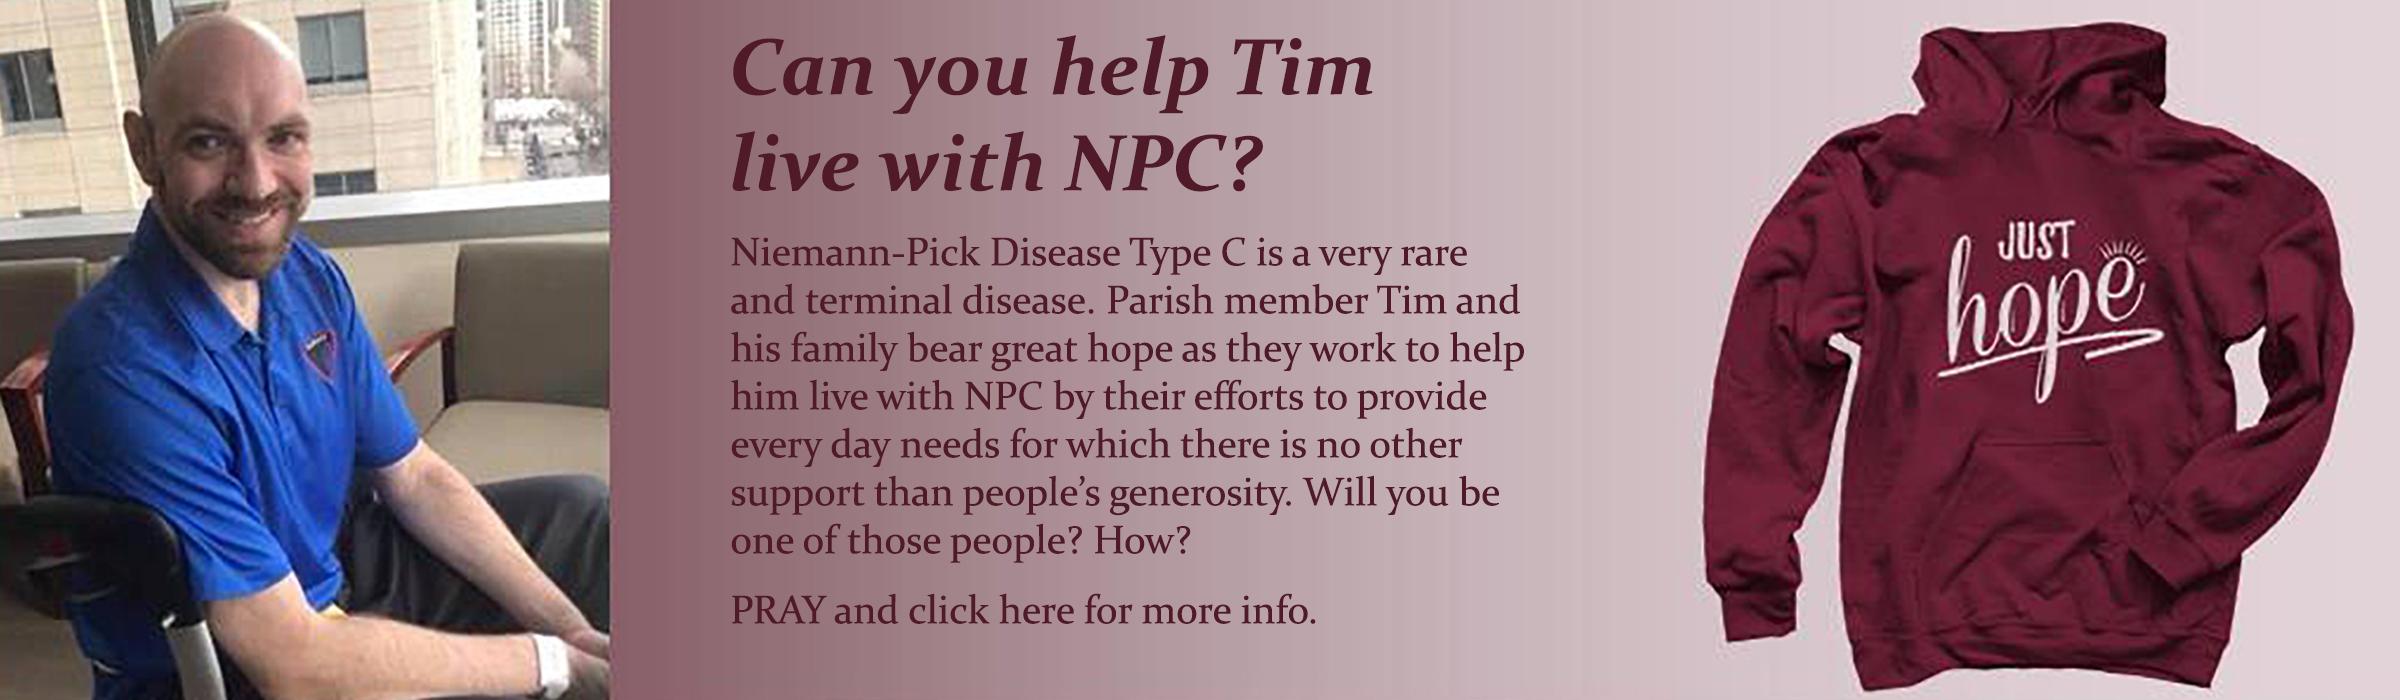 Tim just hope